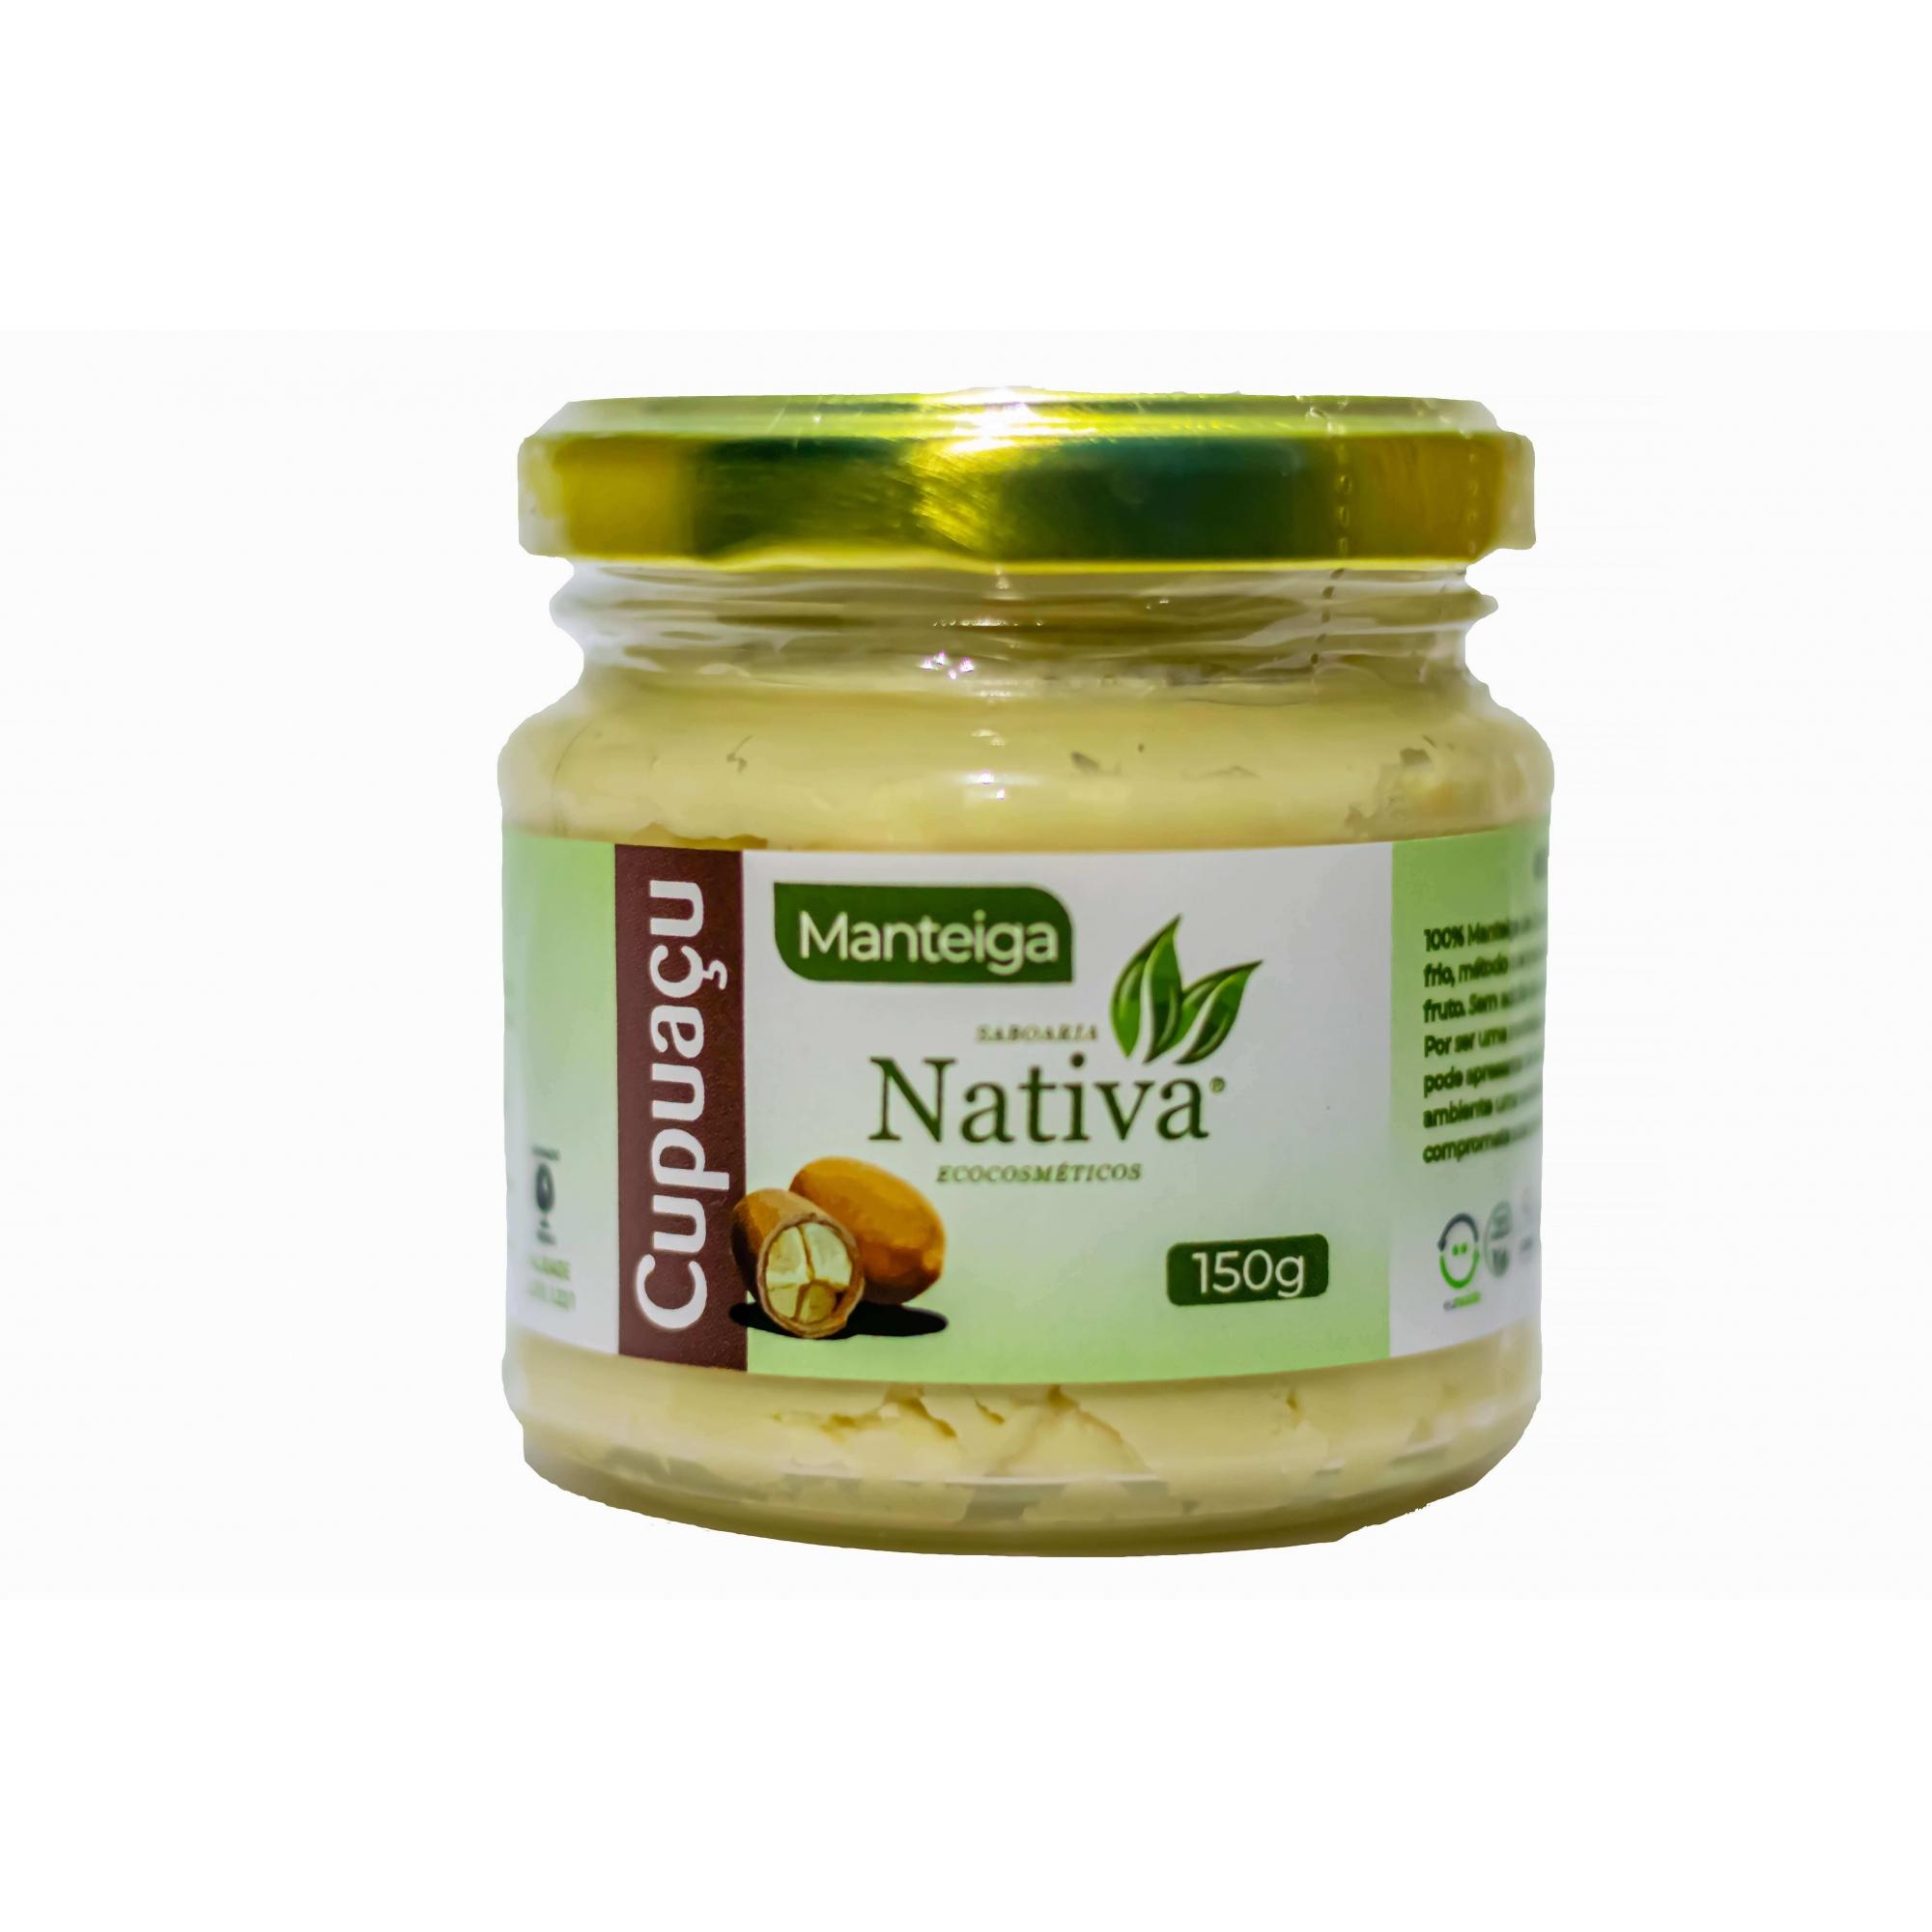 Manteiga de Cupuaçu - 150g  - Saboaria Nativa Ecocosméticos